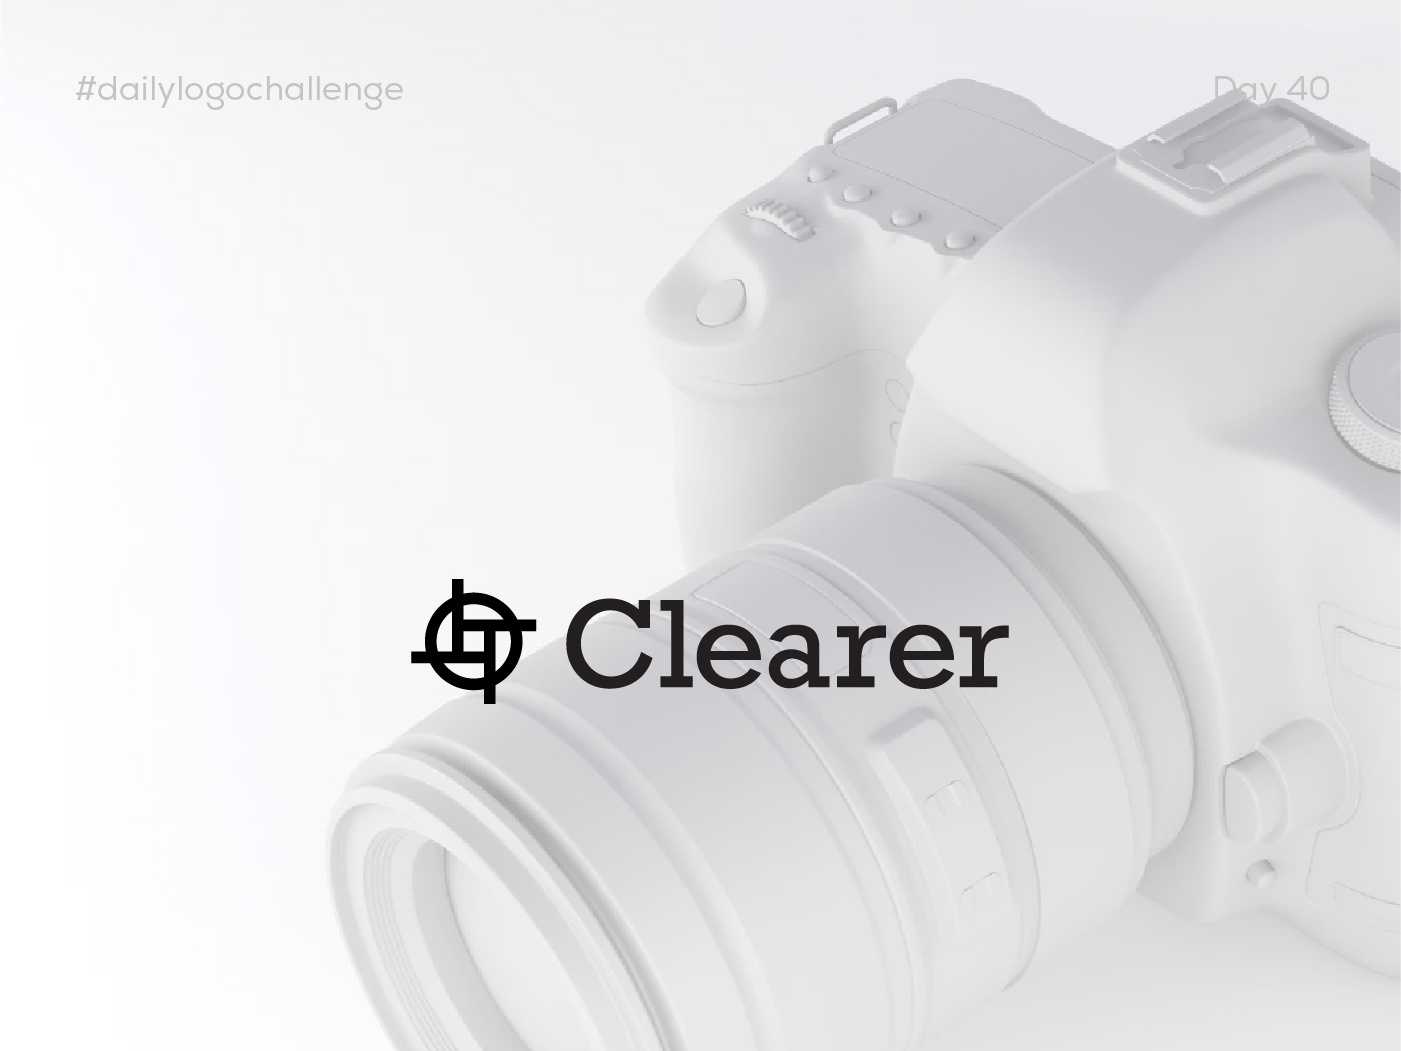 Dailychallenge Insta Shots Pt4 10 app logo app lens minimalist dailylogochallenge branding logo vector typography design mirasadesign mirasa